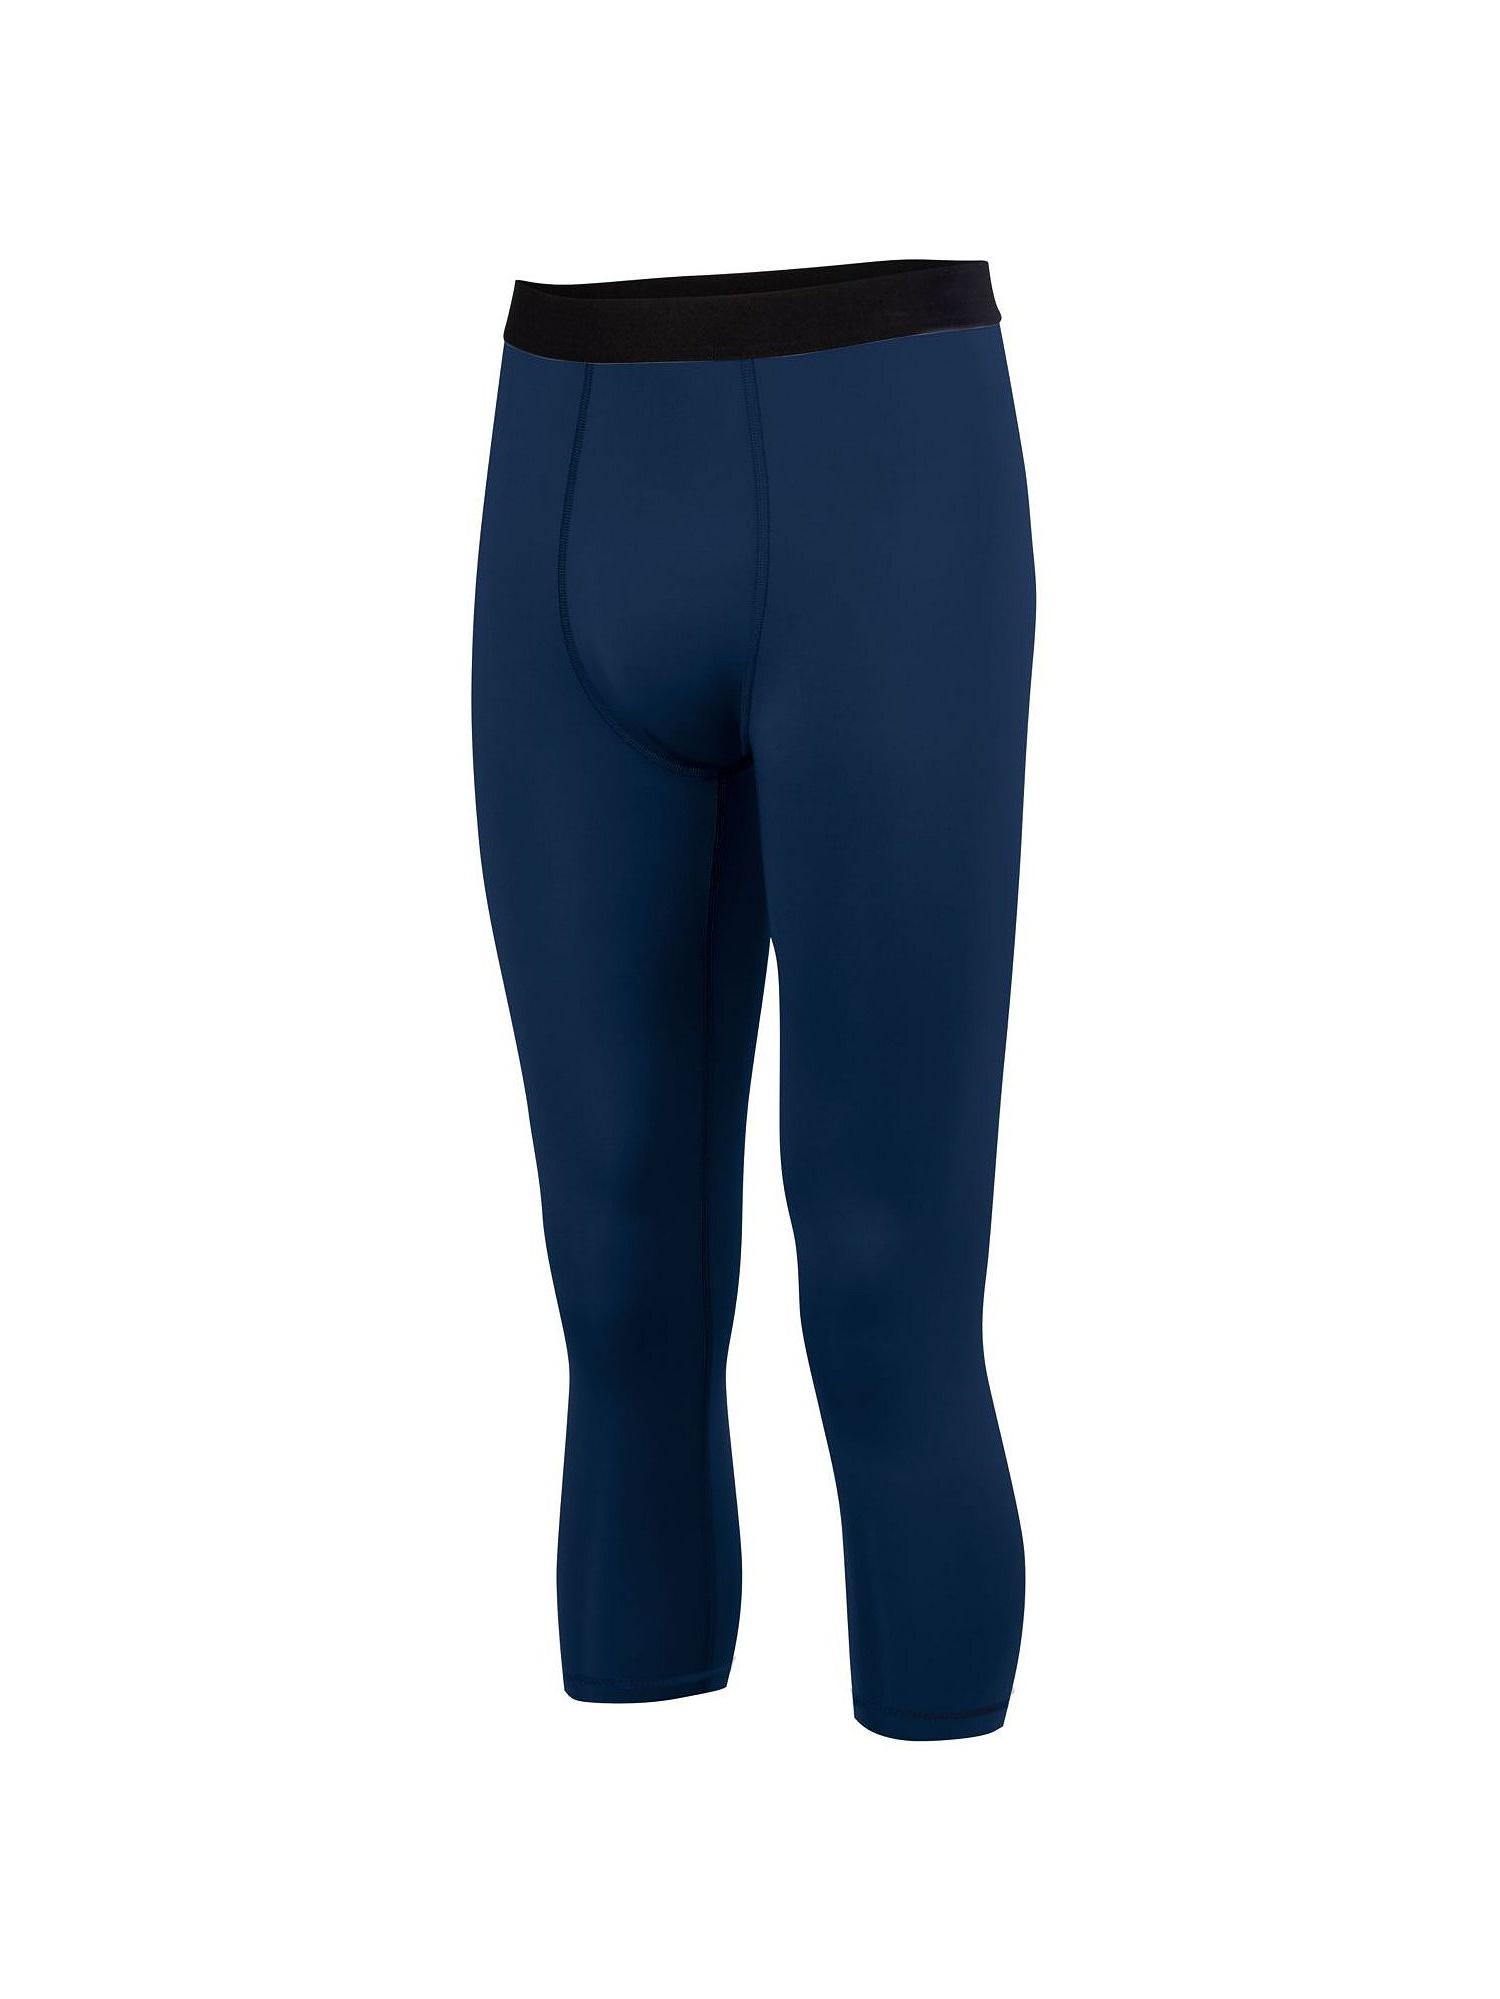 Augusta Sportswear Men's Hyperform Compression Calf-Length Tight 2618